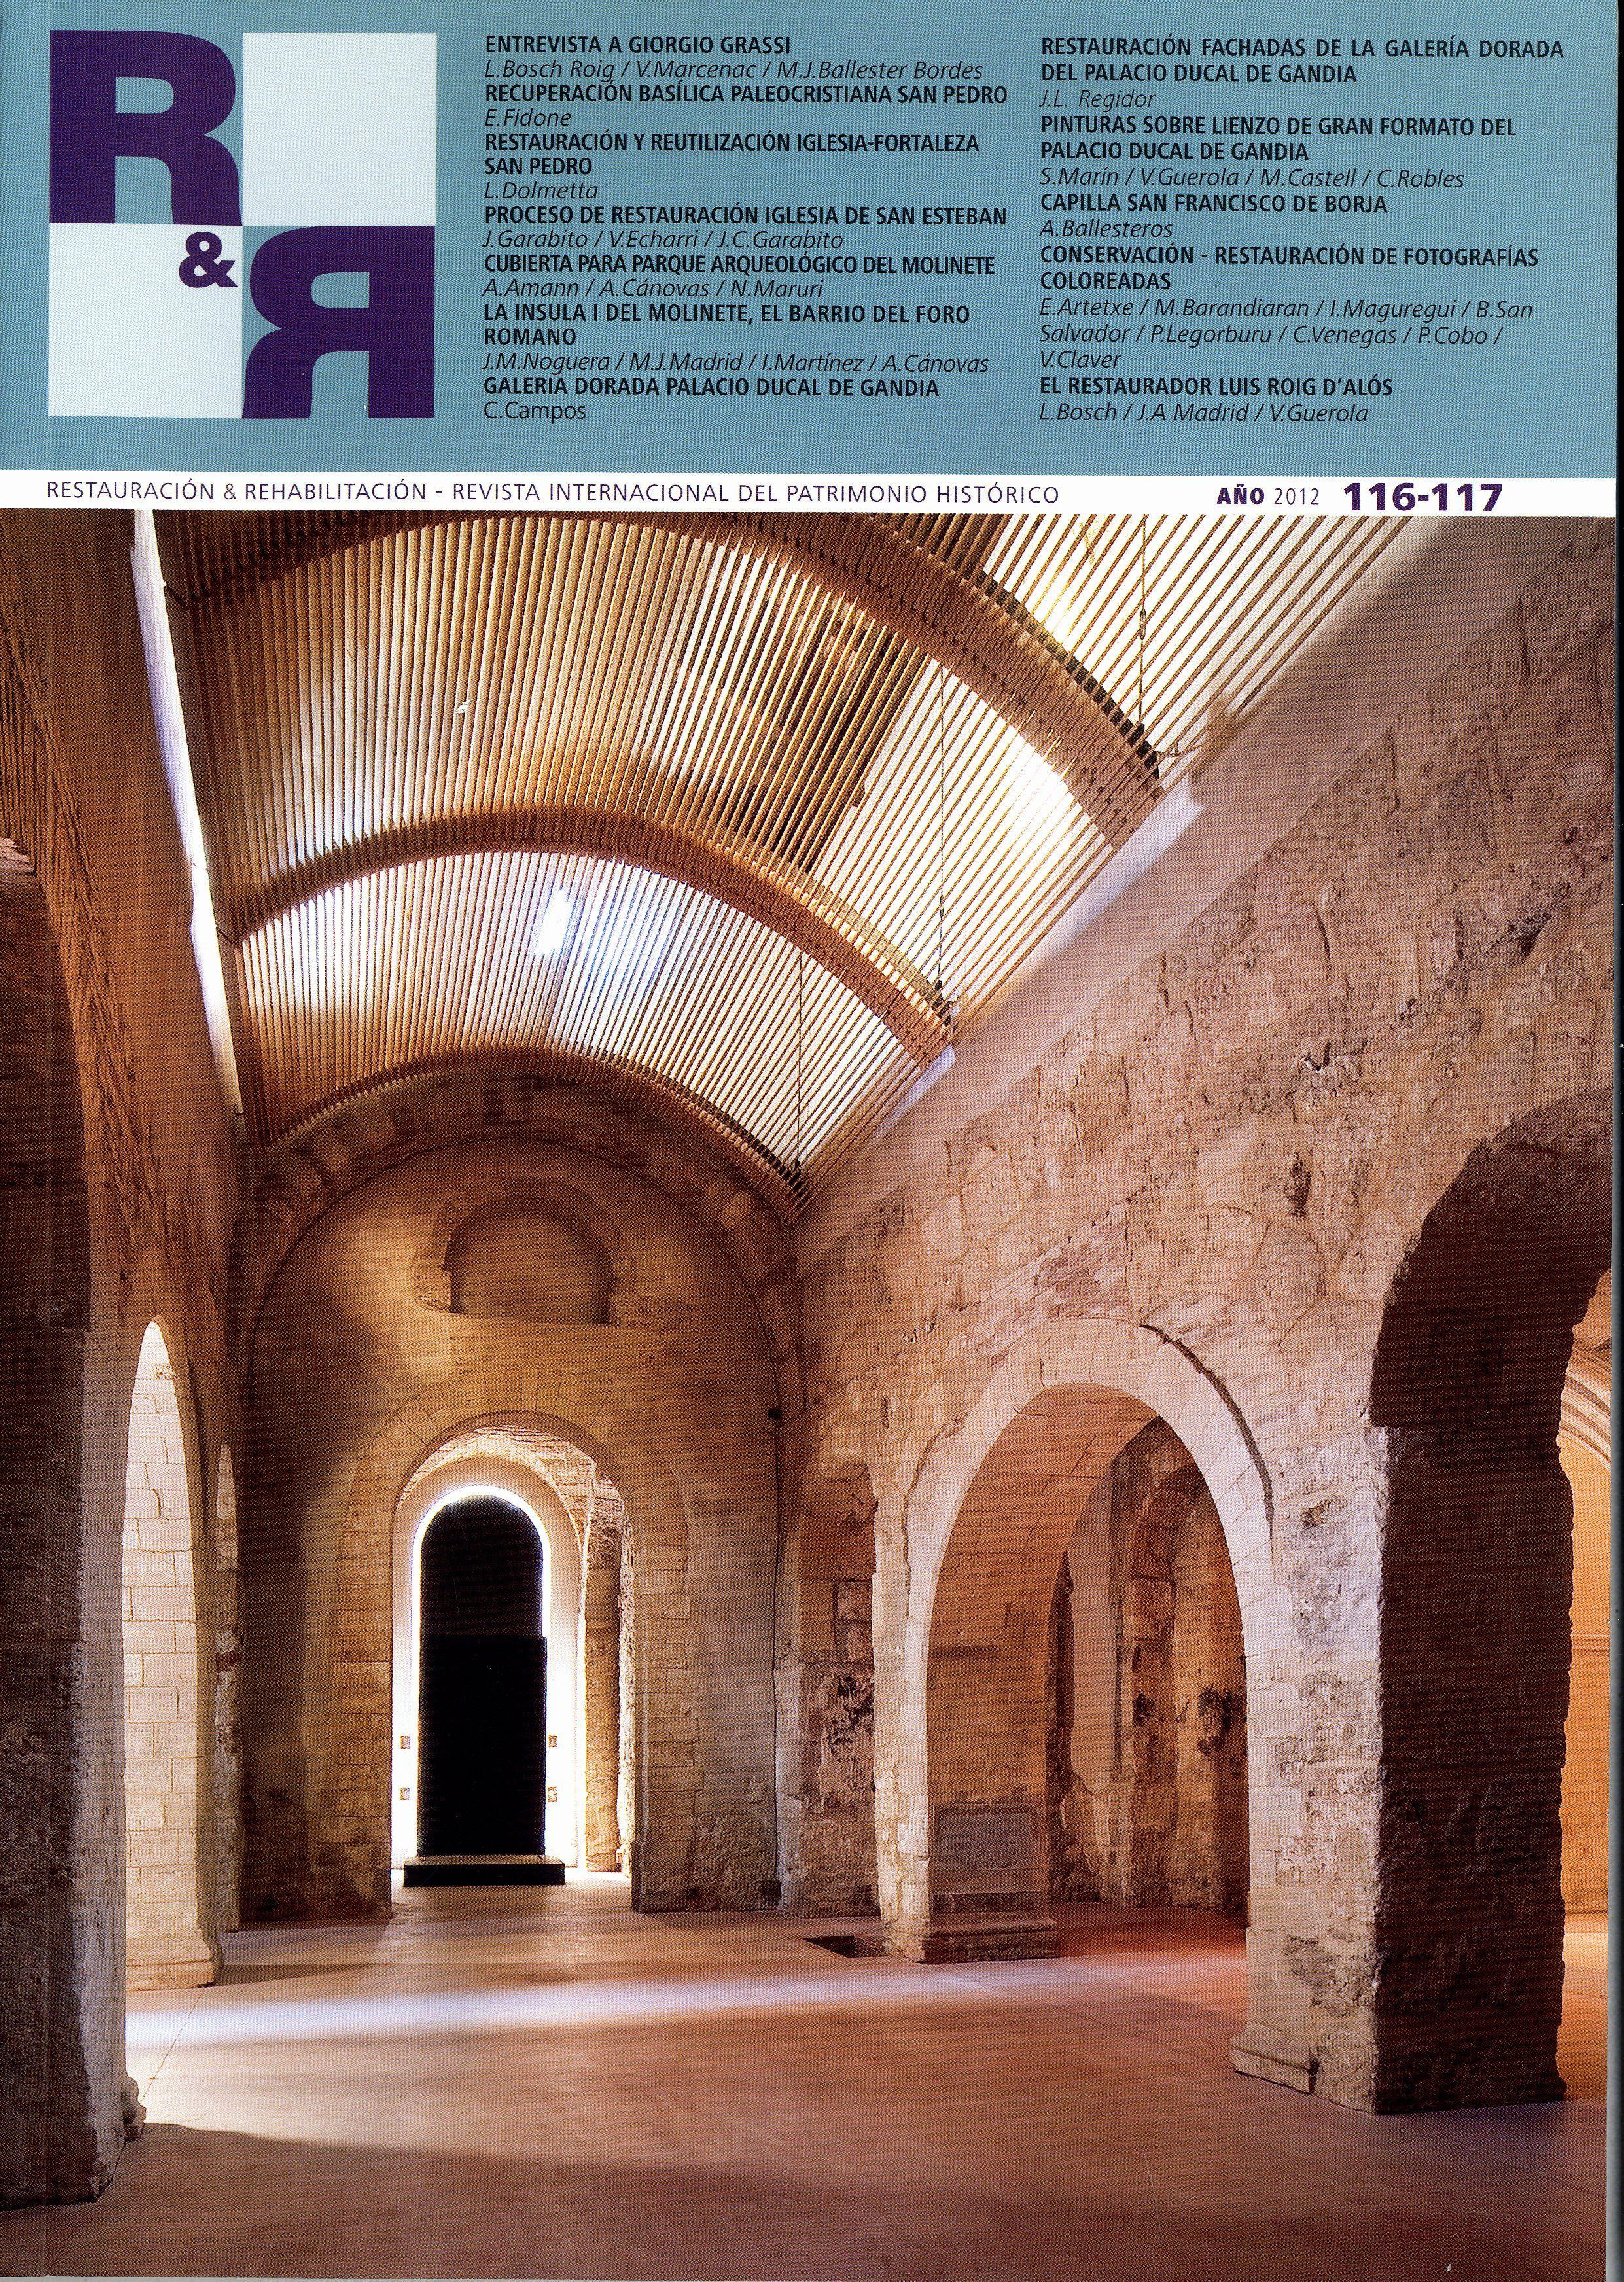 Restauraci n rehabilitaci n issn 1134 4571 fondos upm for Arquitectura de interiores upm